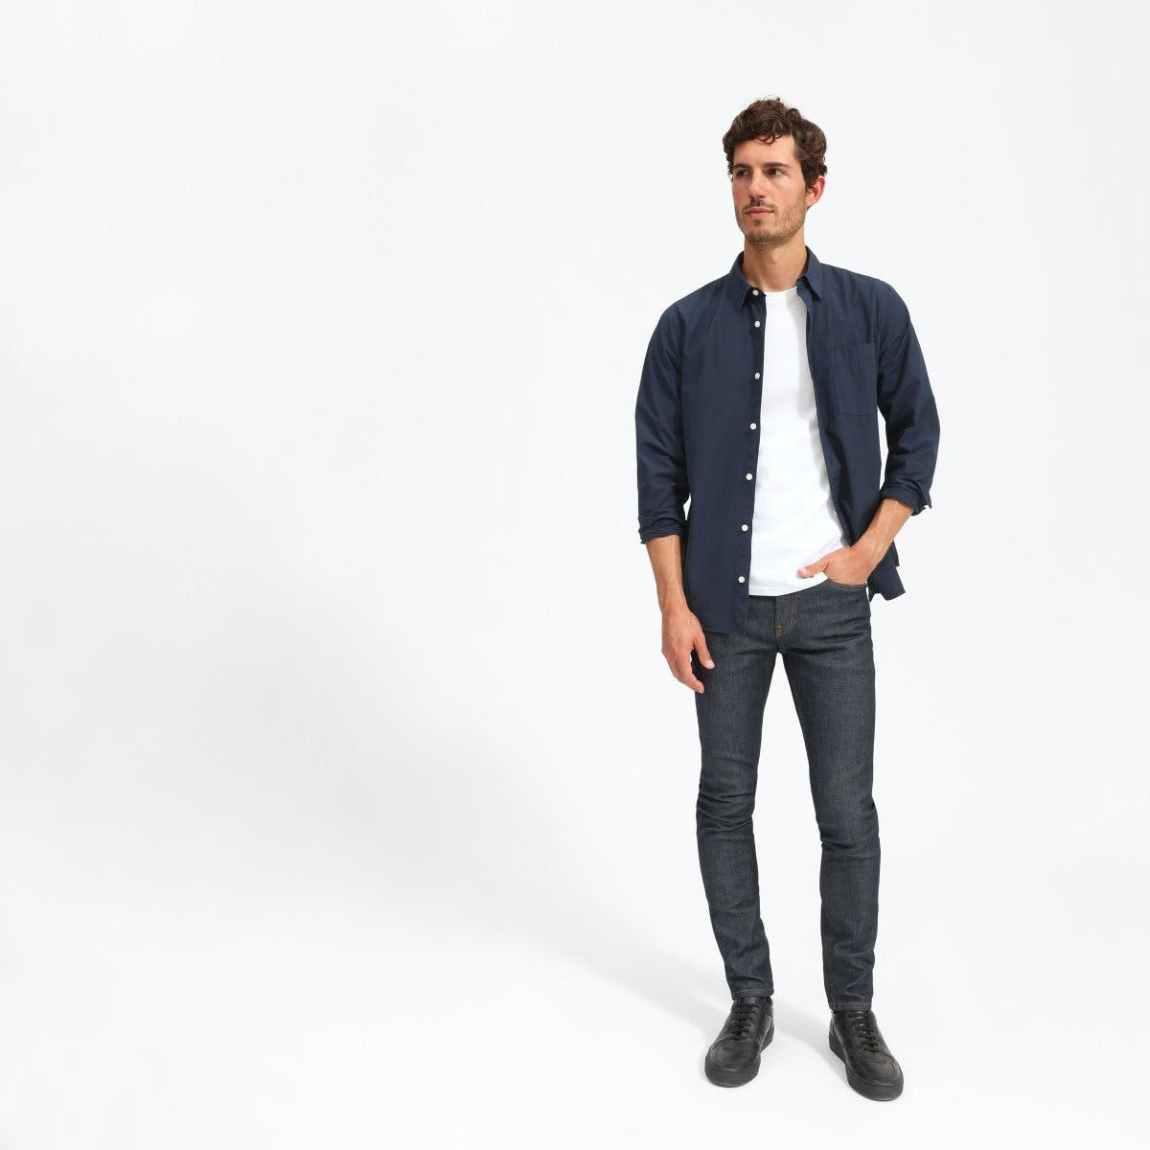 everlane, everlane jeans, everlane denim, japanese denim, skinny jeans, slim jeans, raw jeans, tapered jeans, denimblog, denim blog